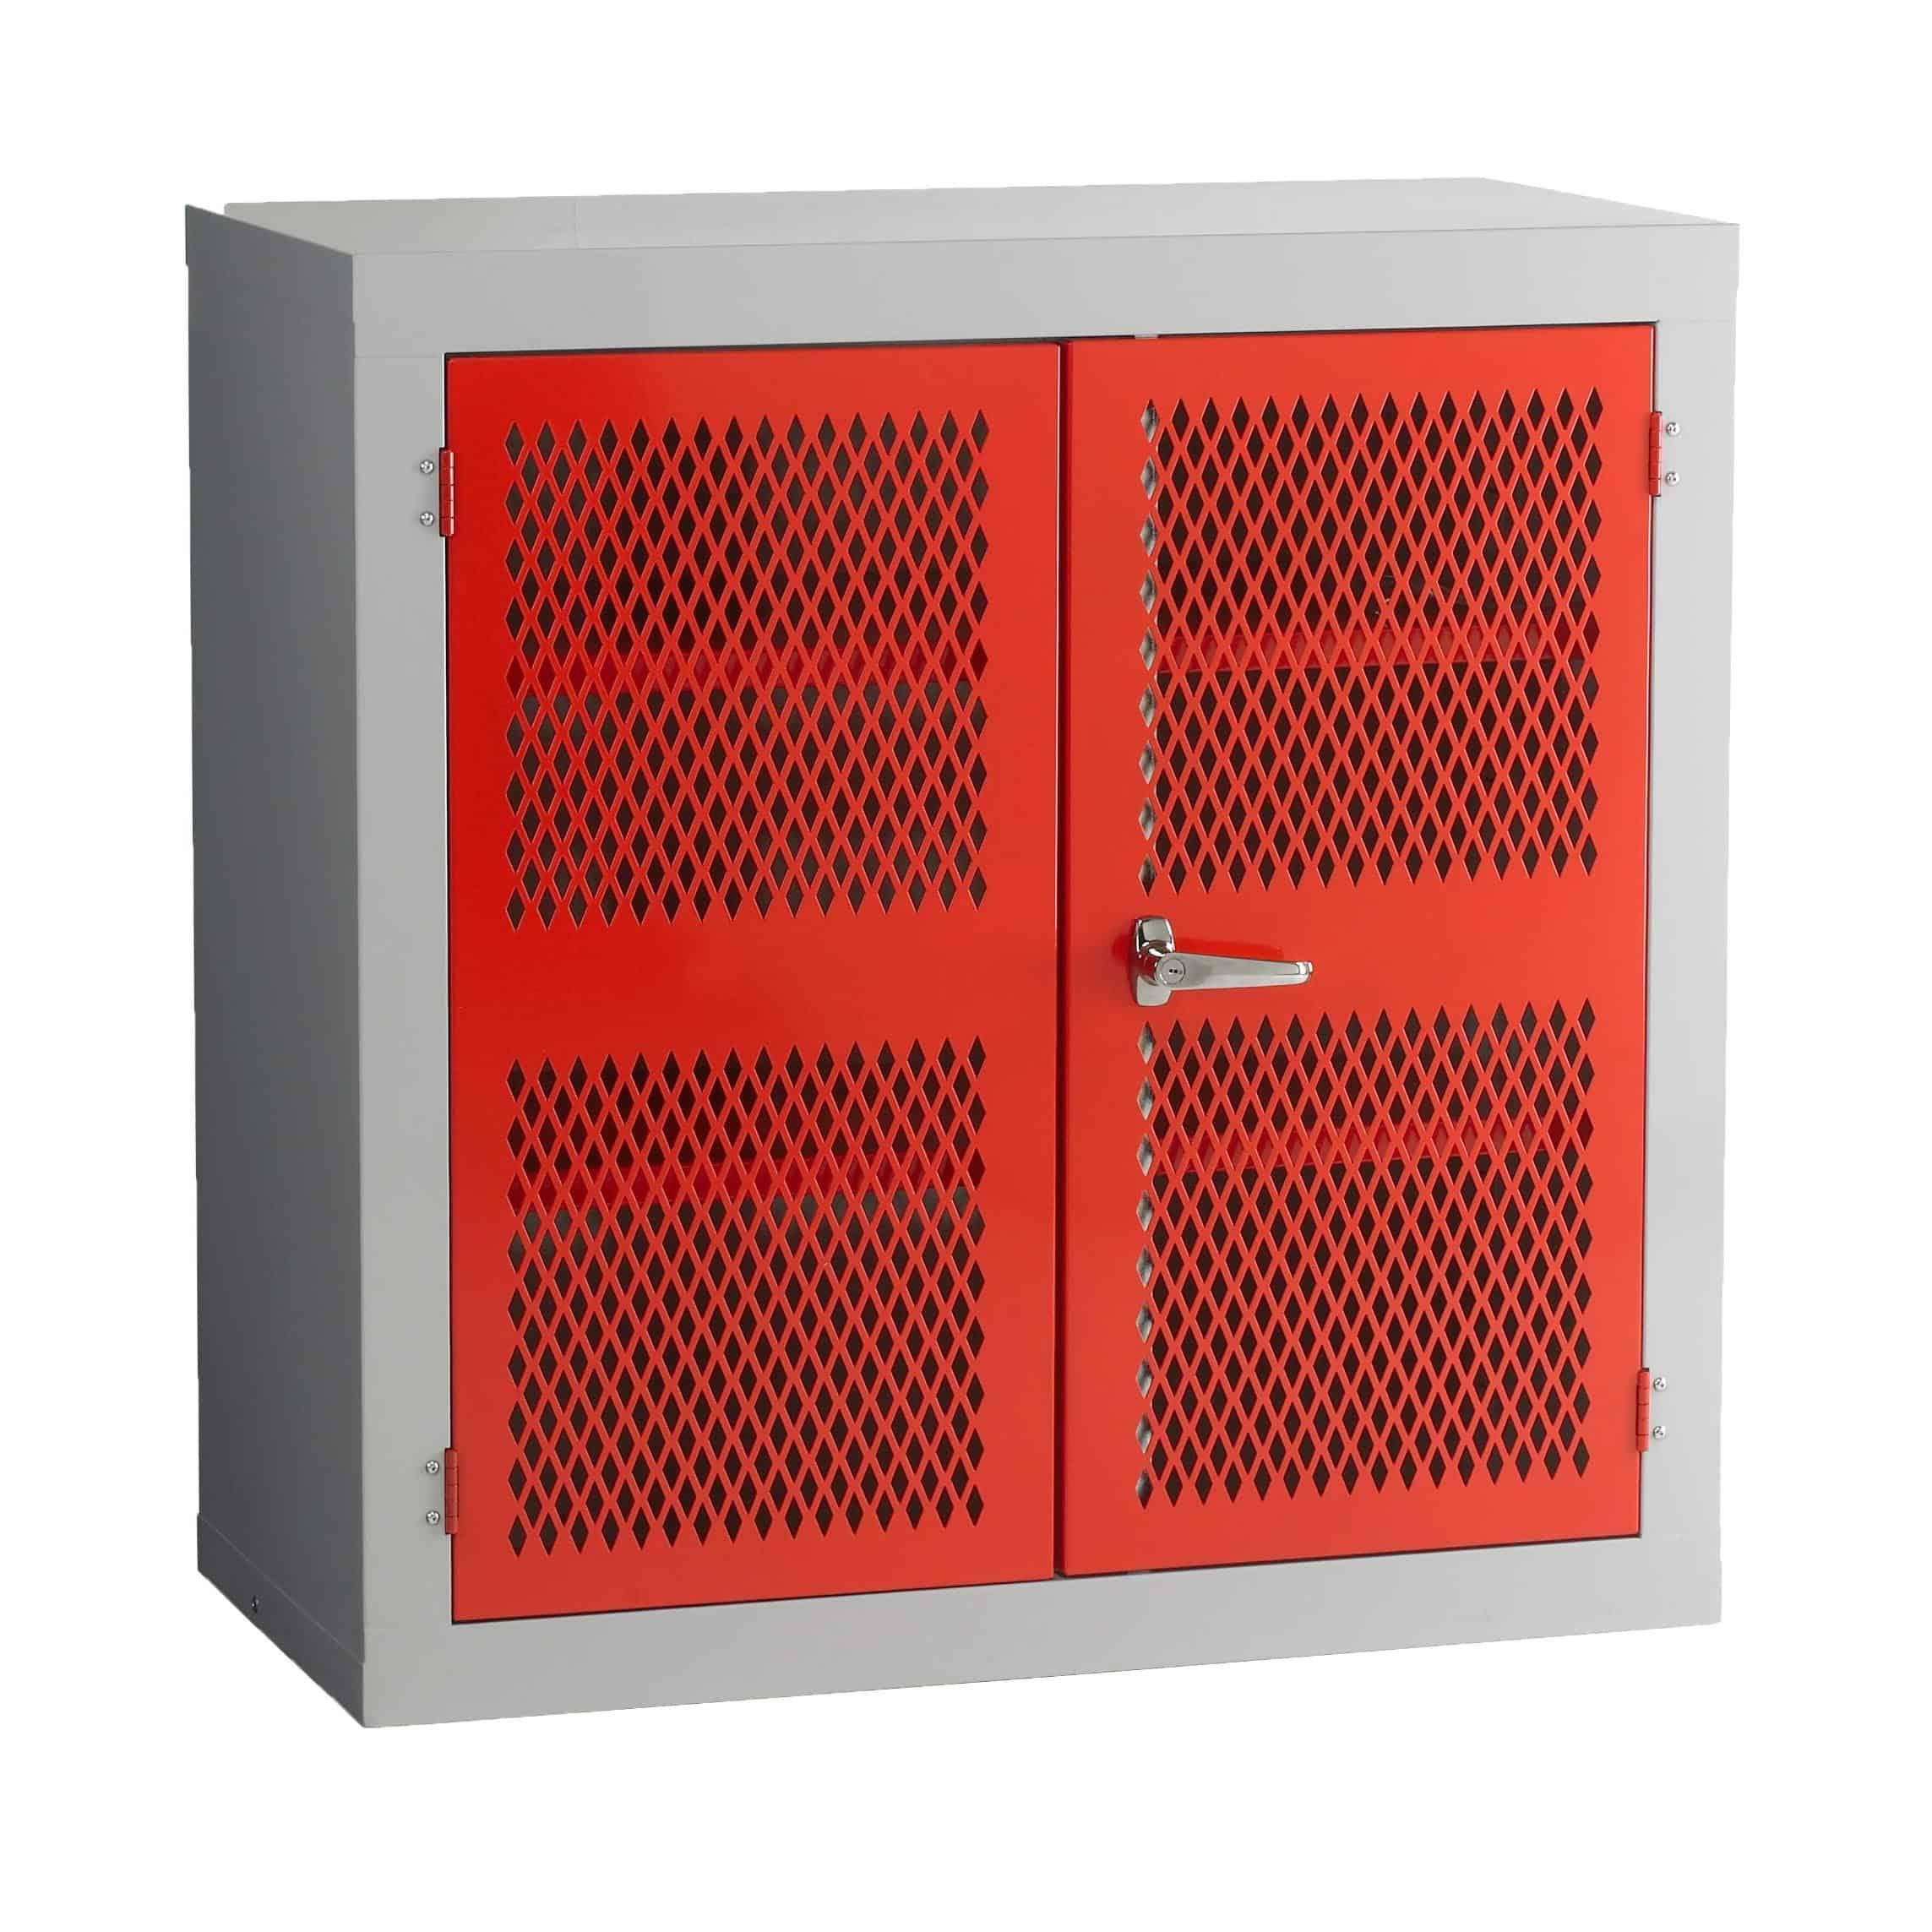 Mesh Door Steel Storage Cabinets Storage N Stuff